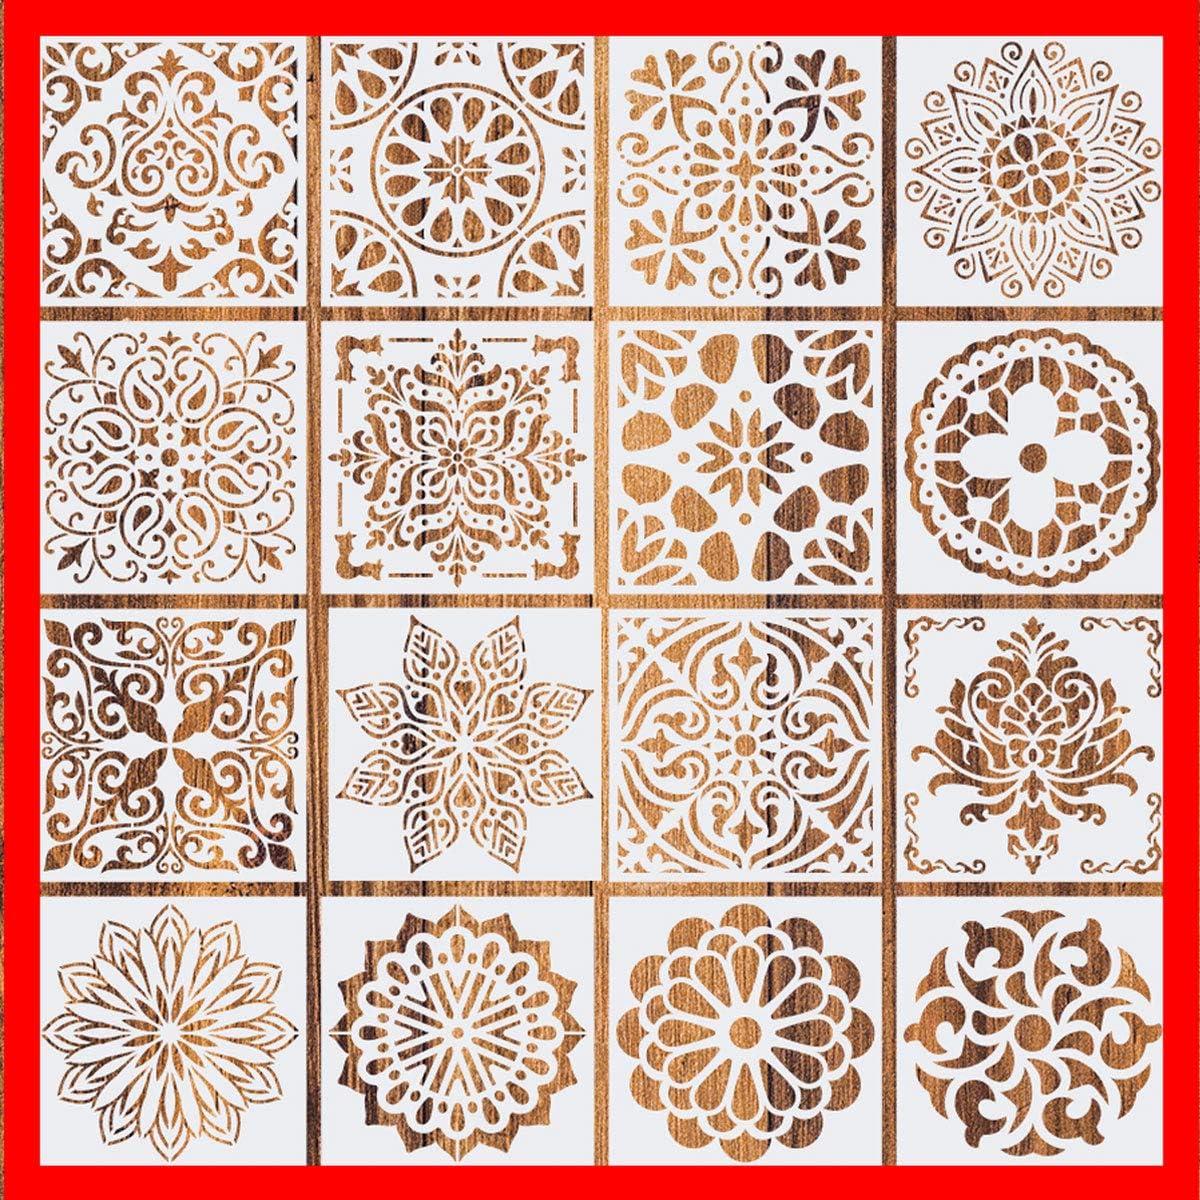 2020 New (6 x 6 inch) Set of 16 - Reusable Mandala Floor Stencil Painting Stencil, Laser Cut Painting Template Floor Wall Tile Fabric Wood Stencils DIY Decor